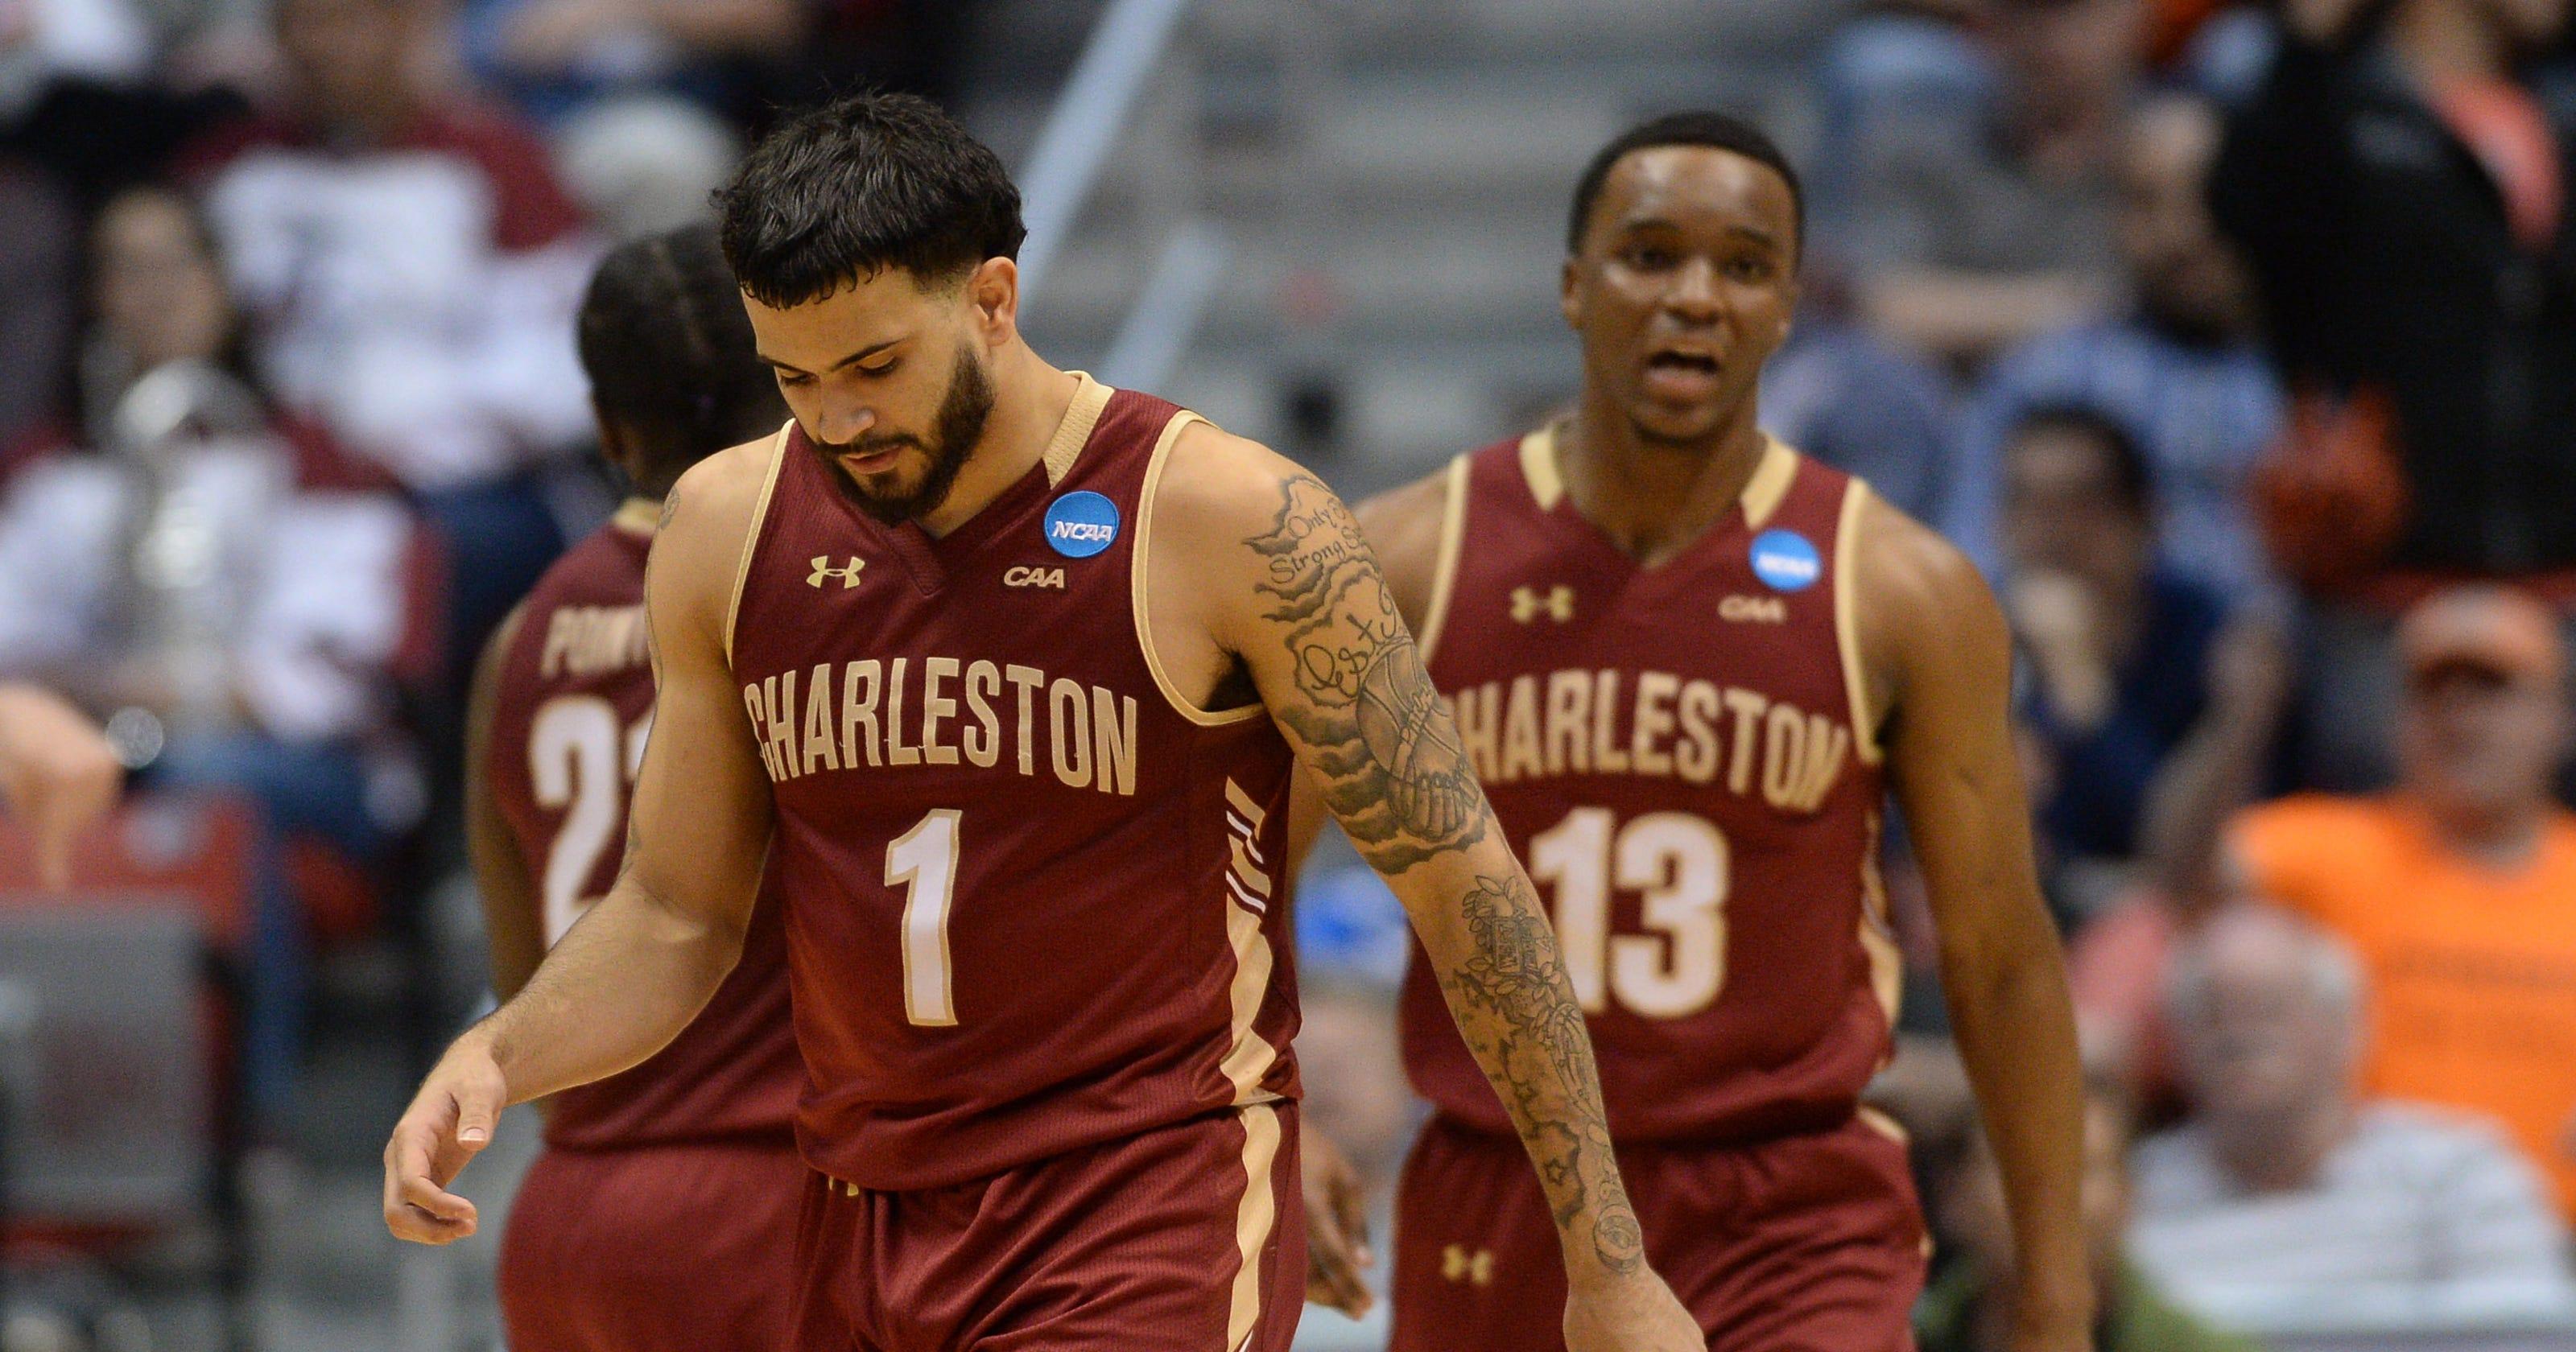 reputable site 4aa81 42dff 2018 NCAA tournament: Did no-call rob Charleston of historic ...